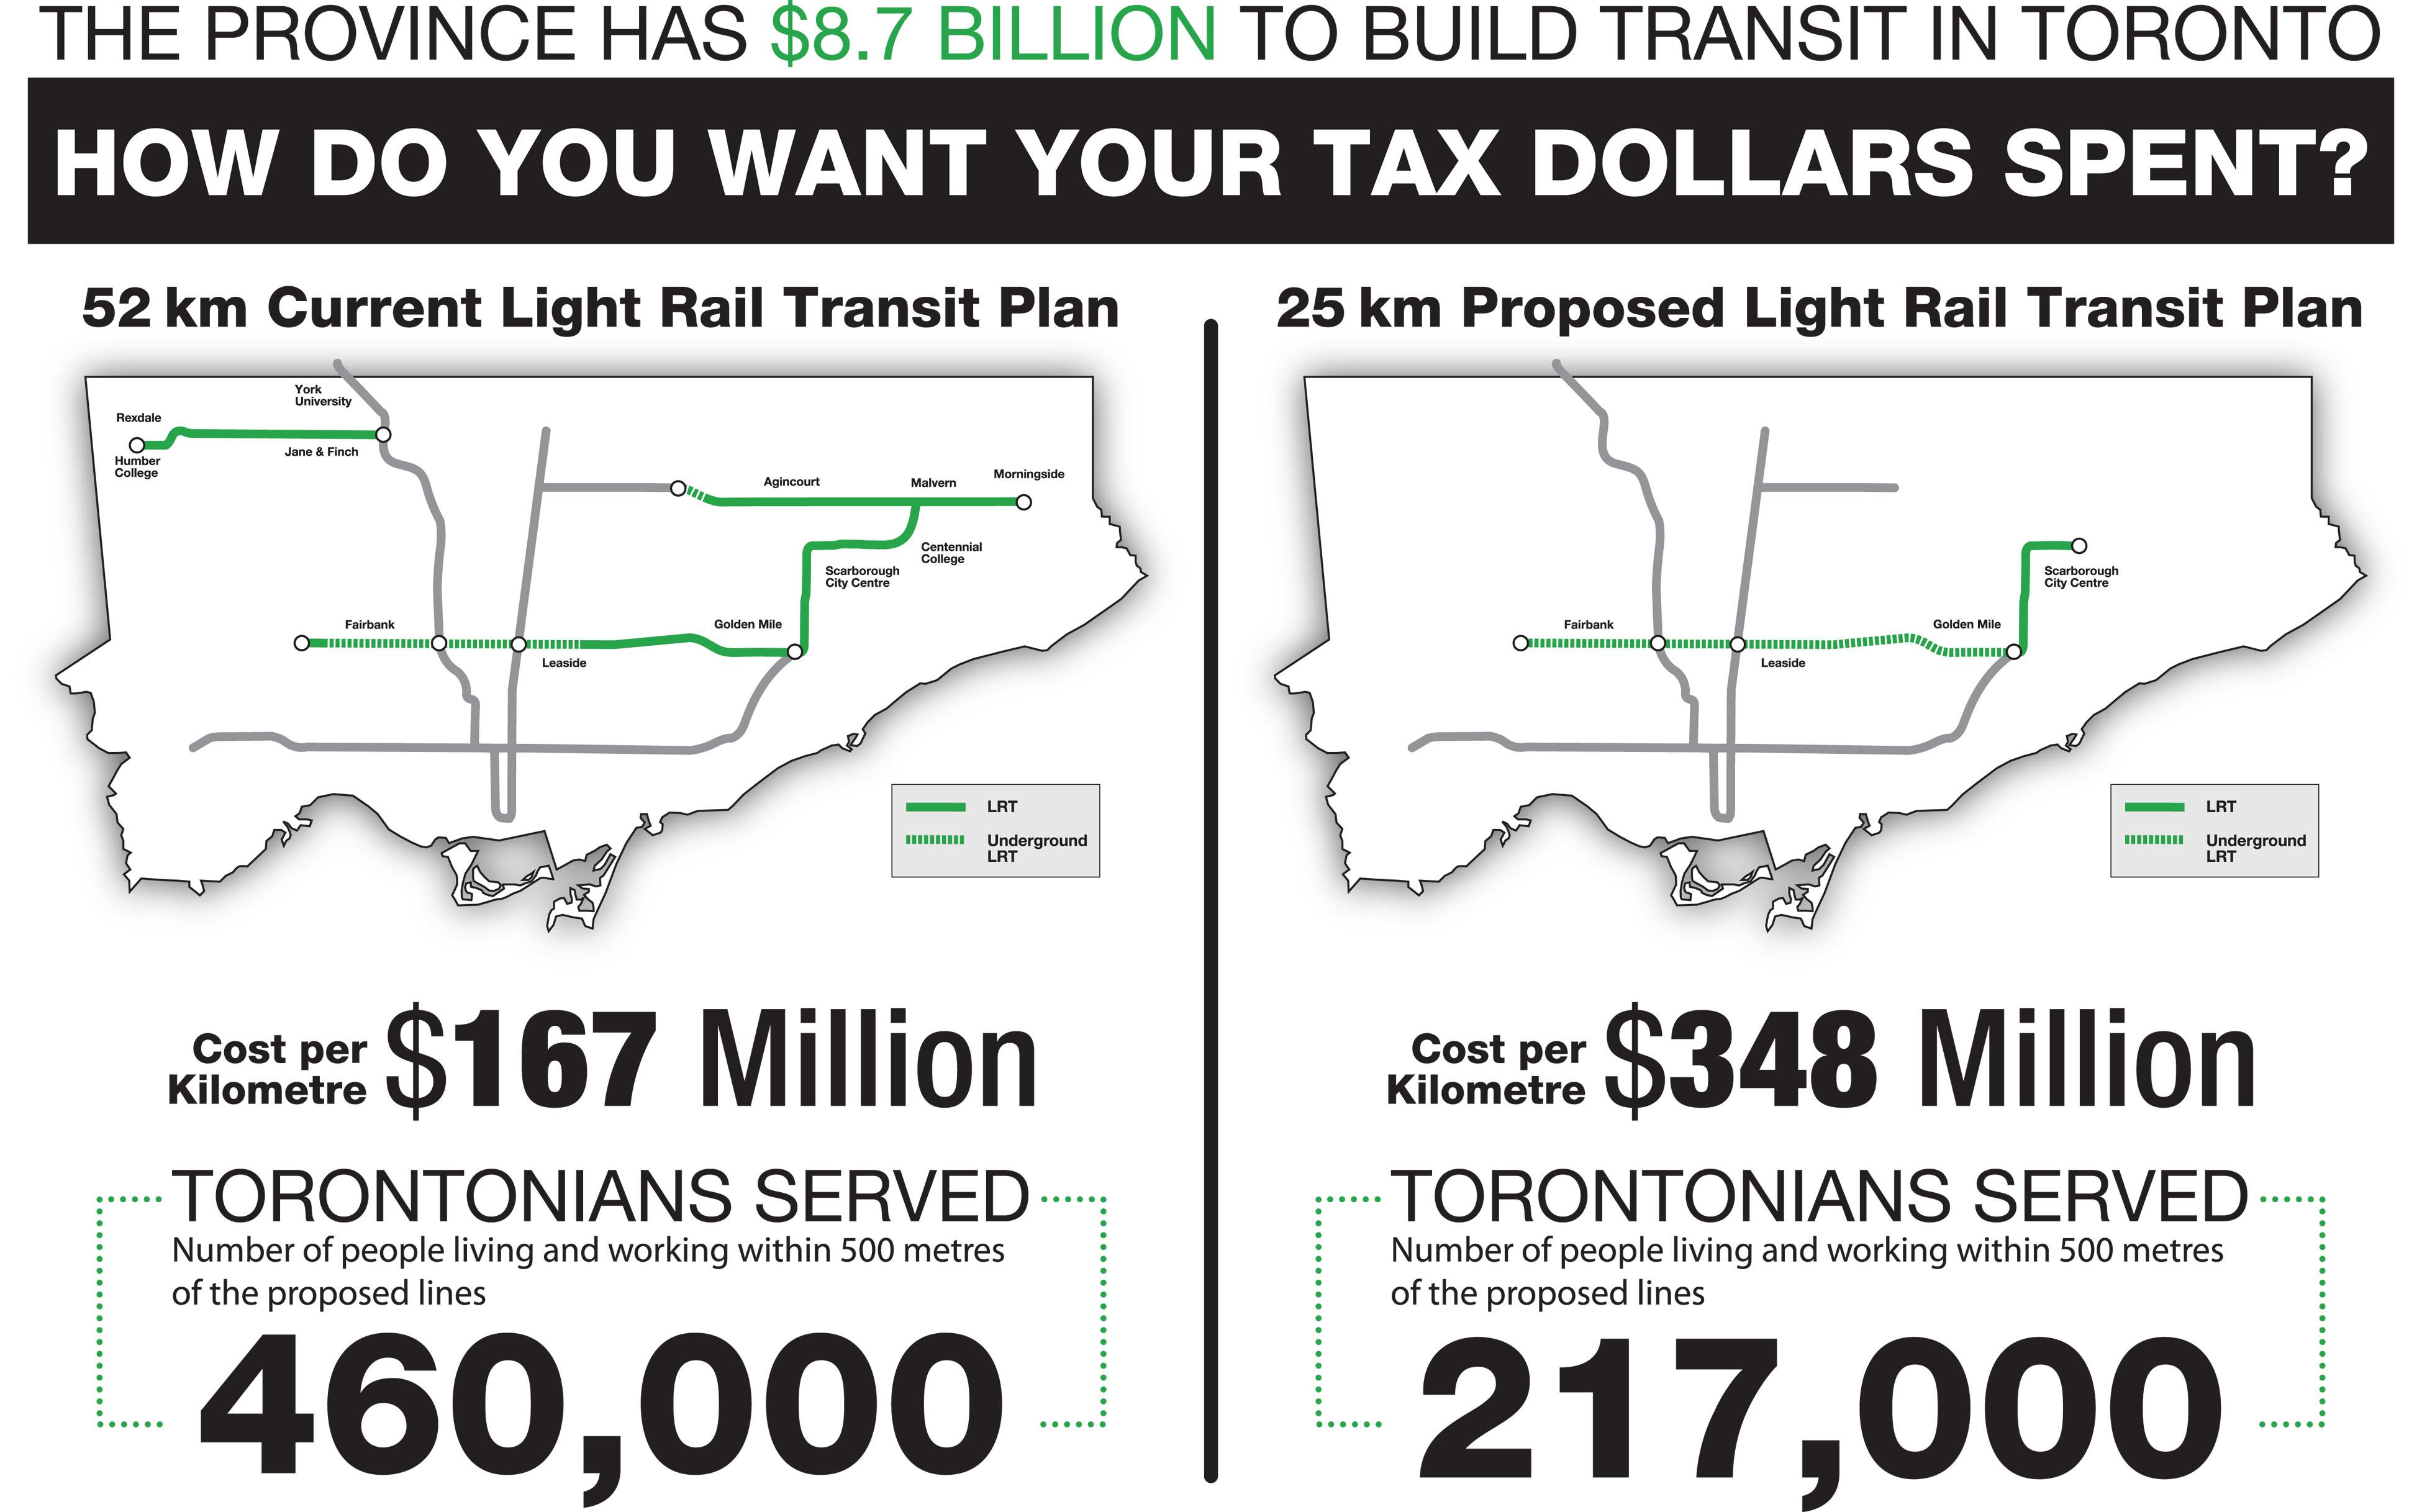 Ttc Subway Map Future.Provincial Transit Funding Leaves Suburbs Behind 2011 Toronto